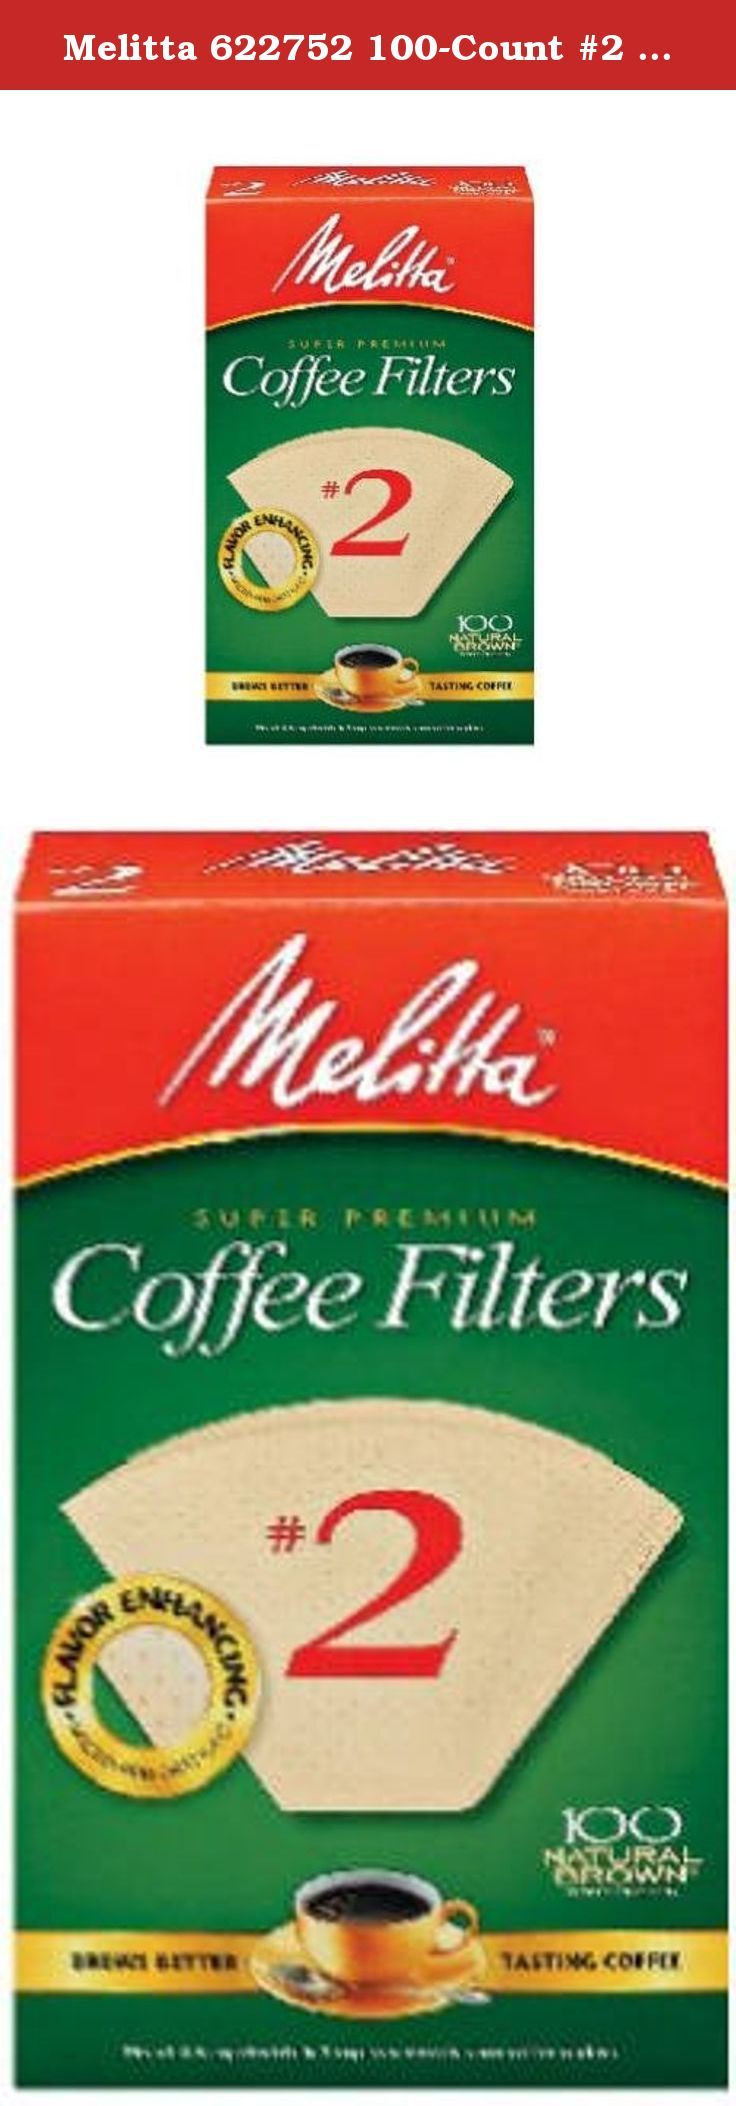 Melitta 622752 100Count 2 Melitta Natural Brown Cone